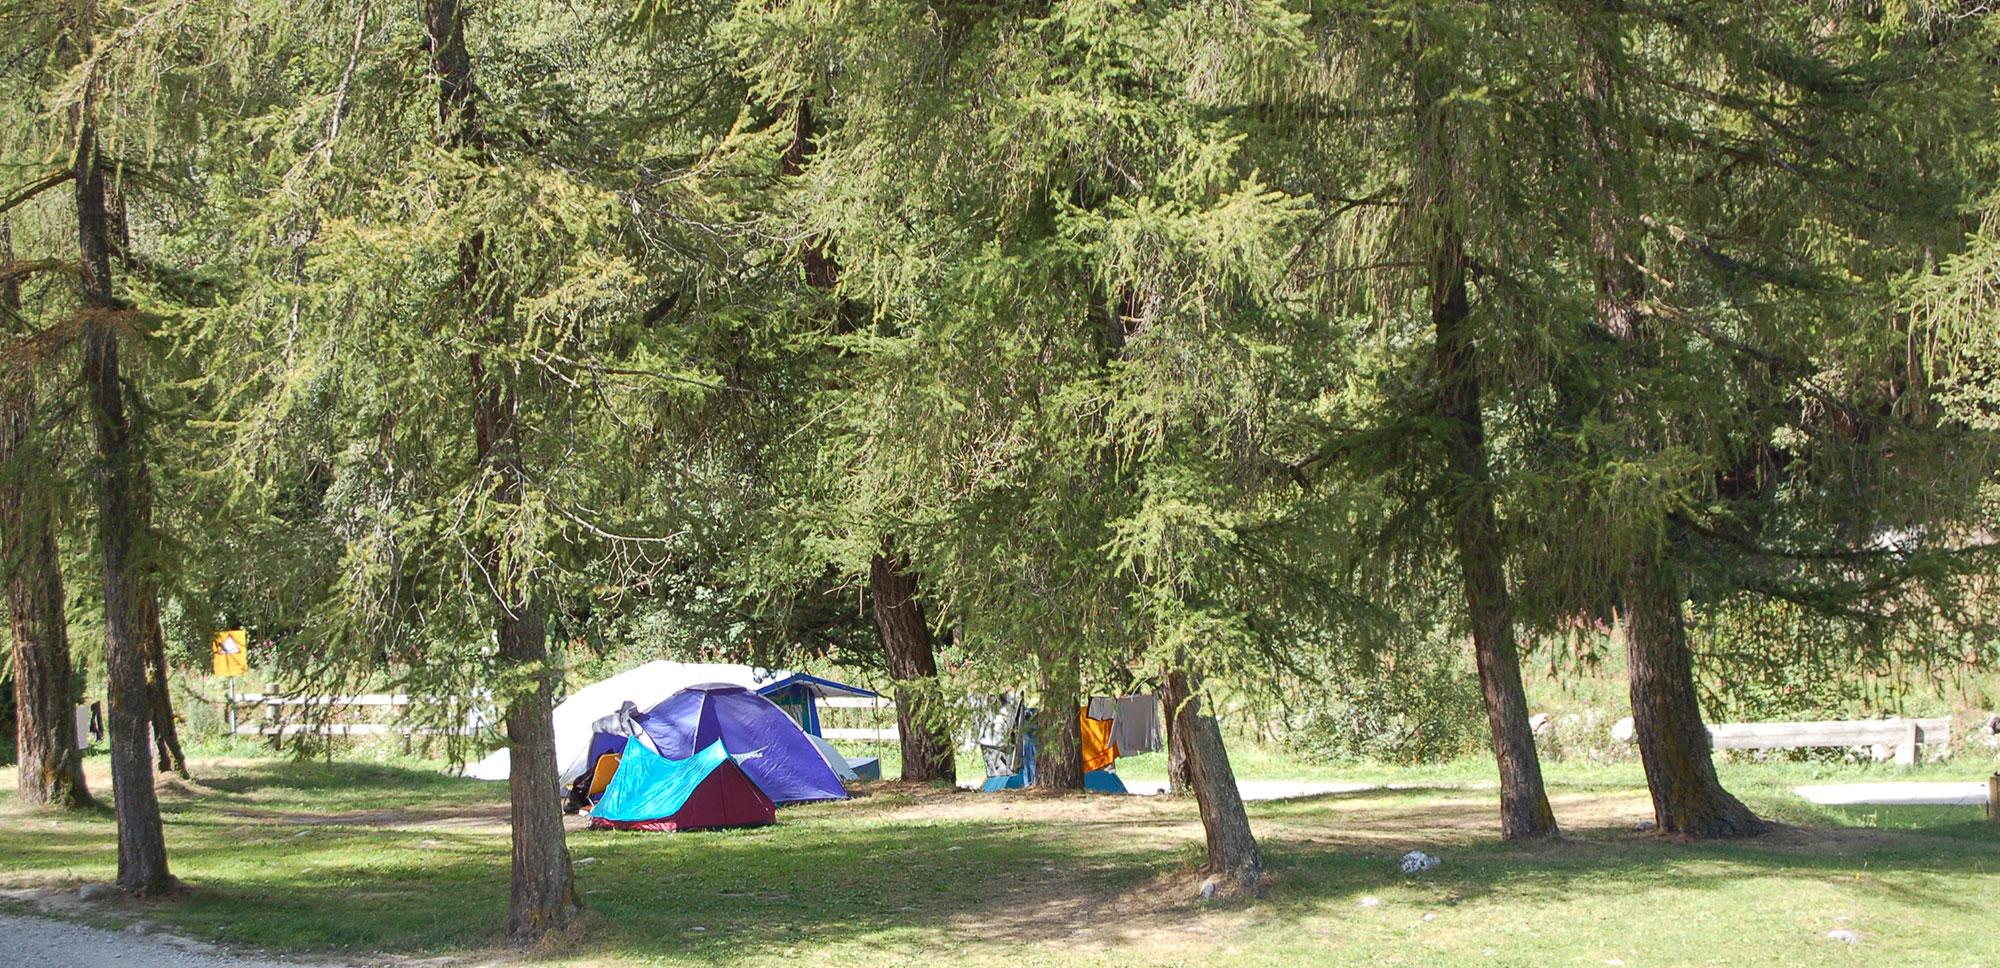 Emplacements de camping ombragés